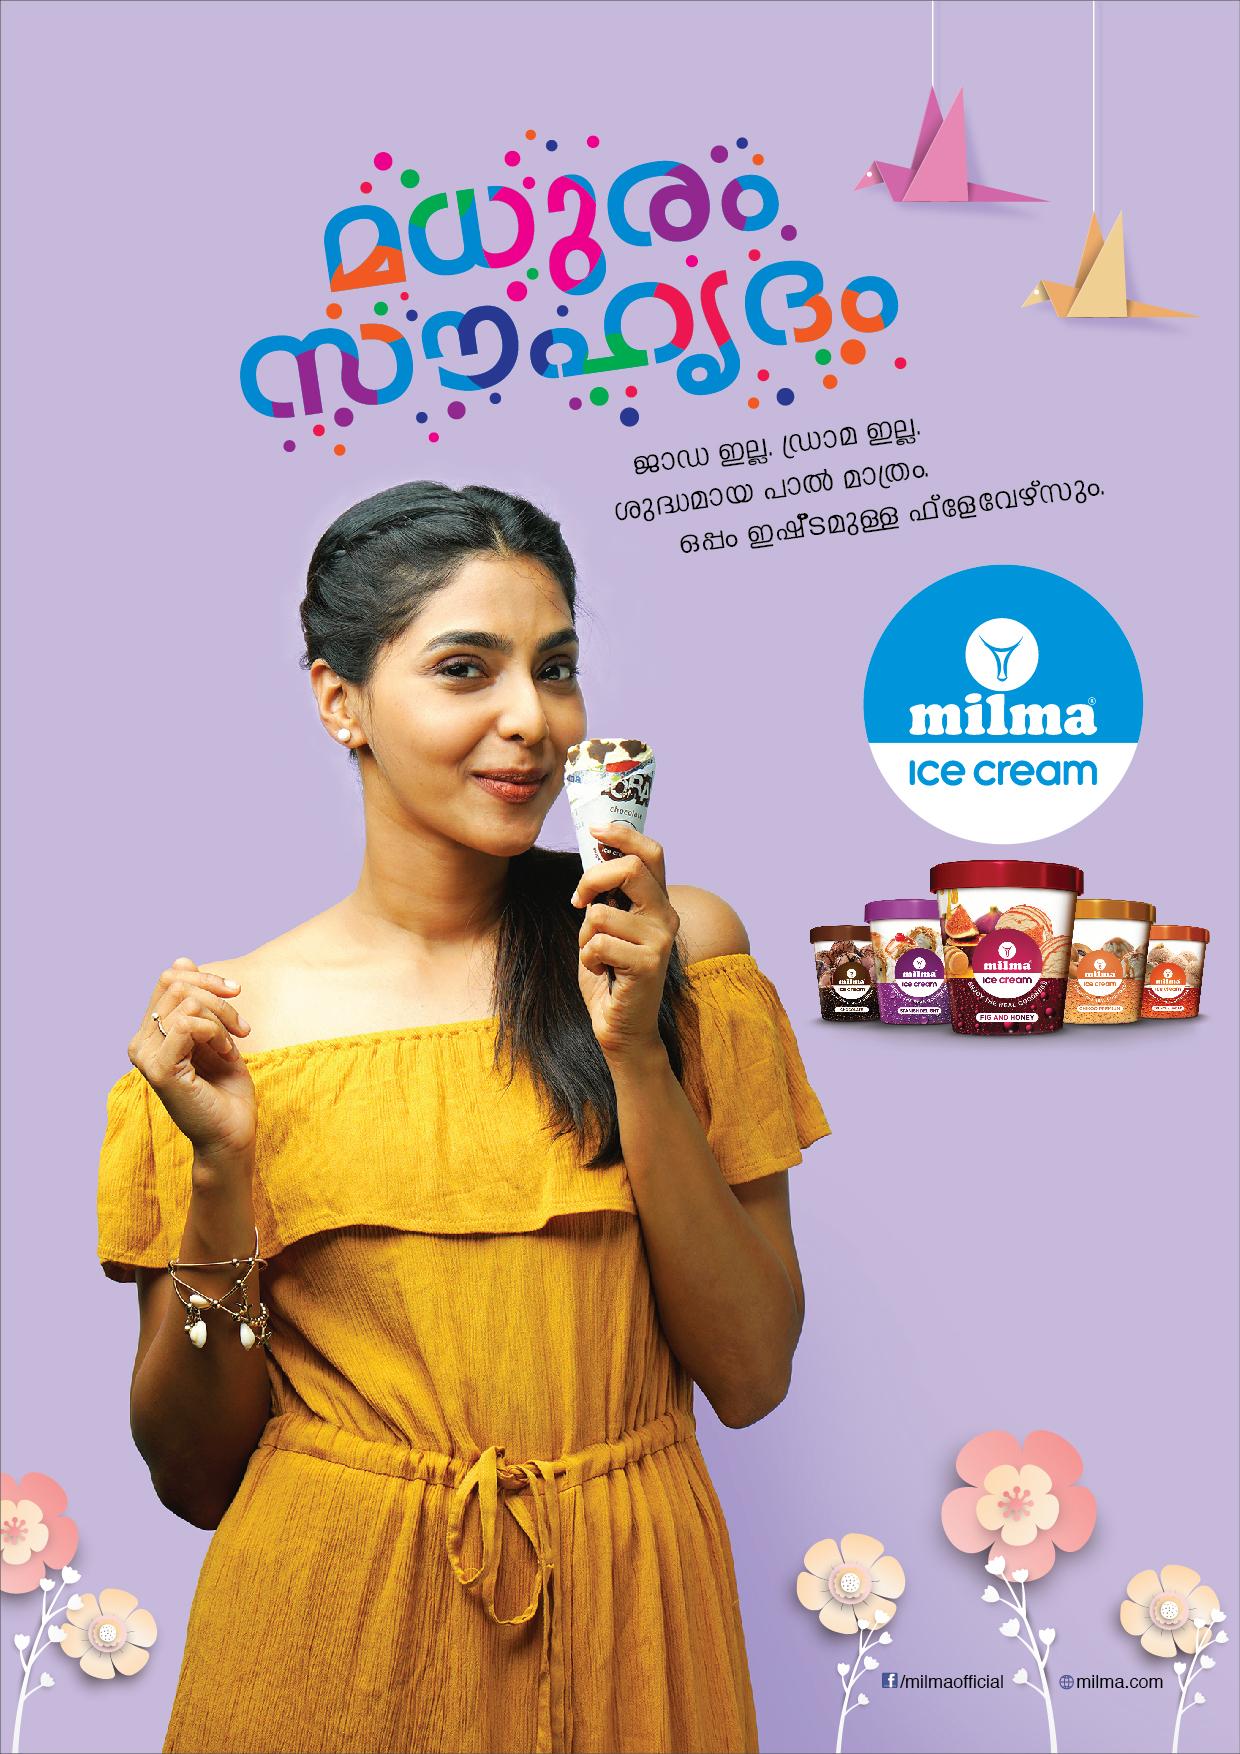 Milma Icecream Advertisement by Malayalam Actress Aishwarya Lekshmi | Print mock-up 3 by Stark Communications Pvt Ltd